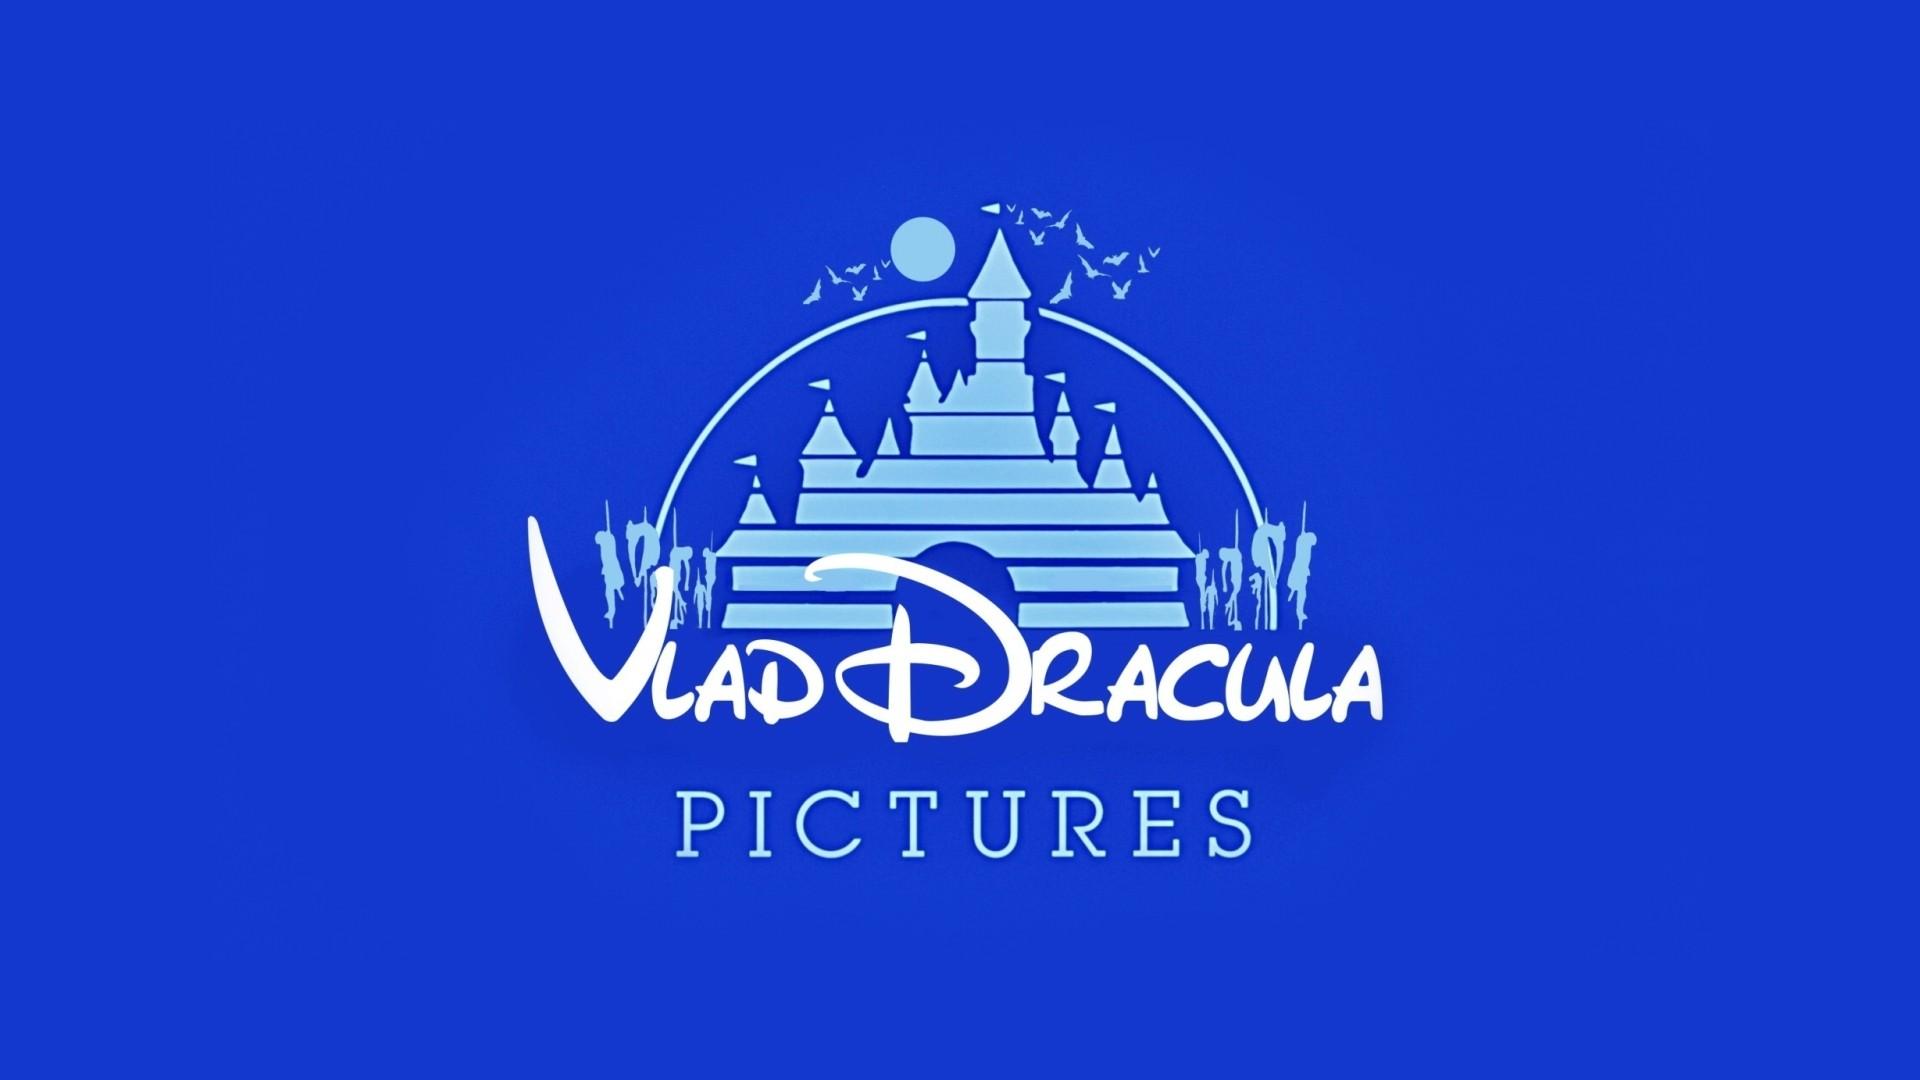 General 1920x1080 humor logo Dracula castle bats blue background Walt Disney blue